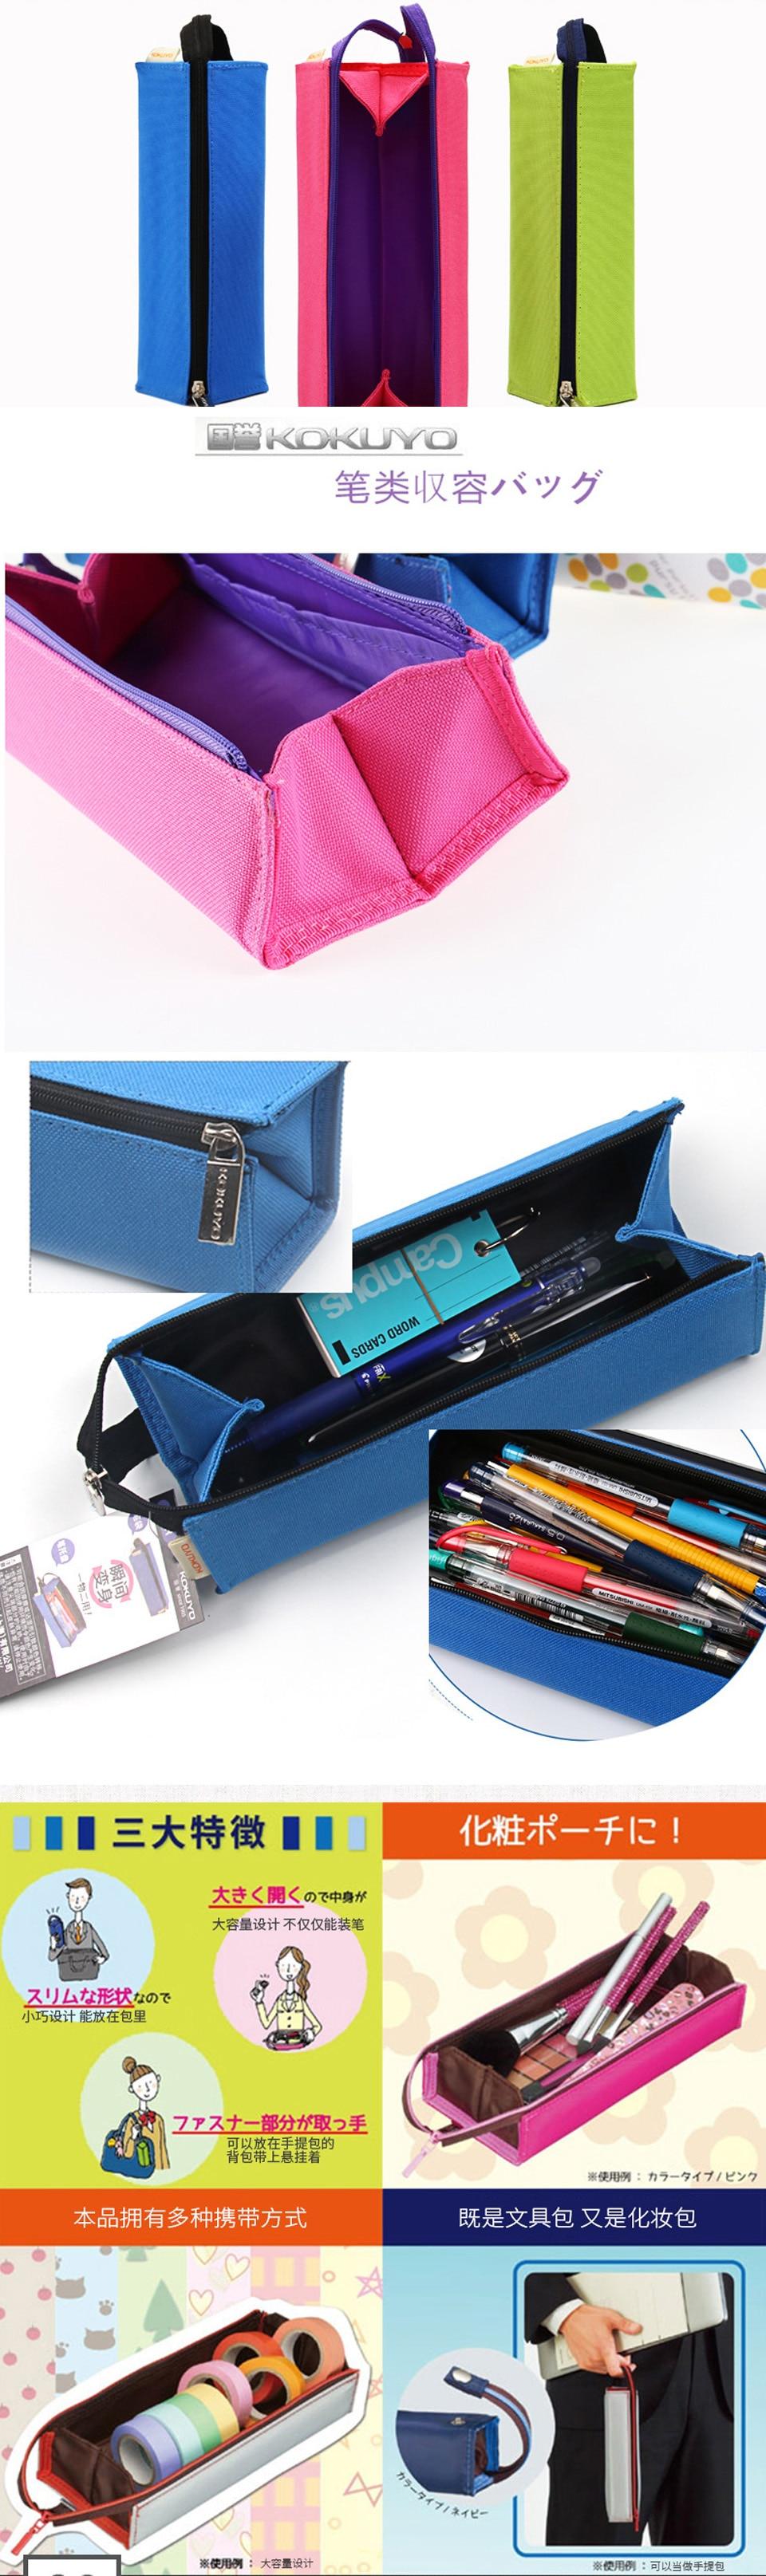 caneta lápis grande capacidade openinglarge saco de